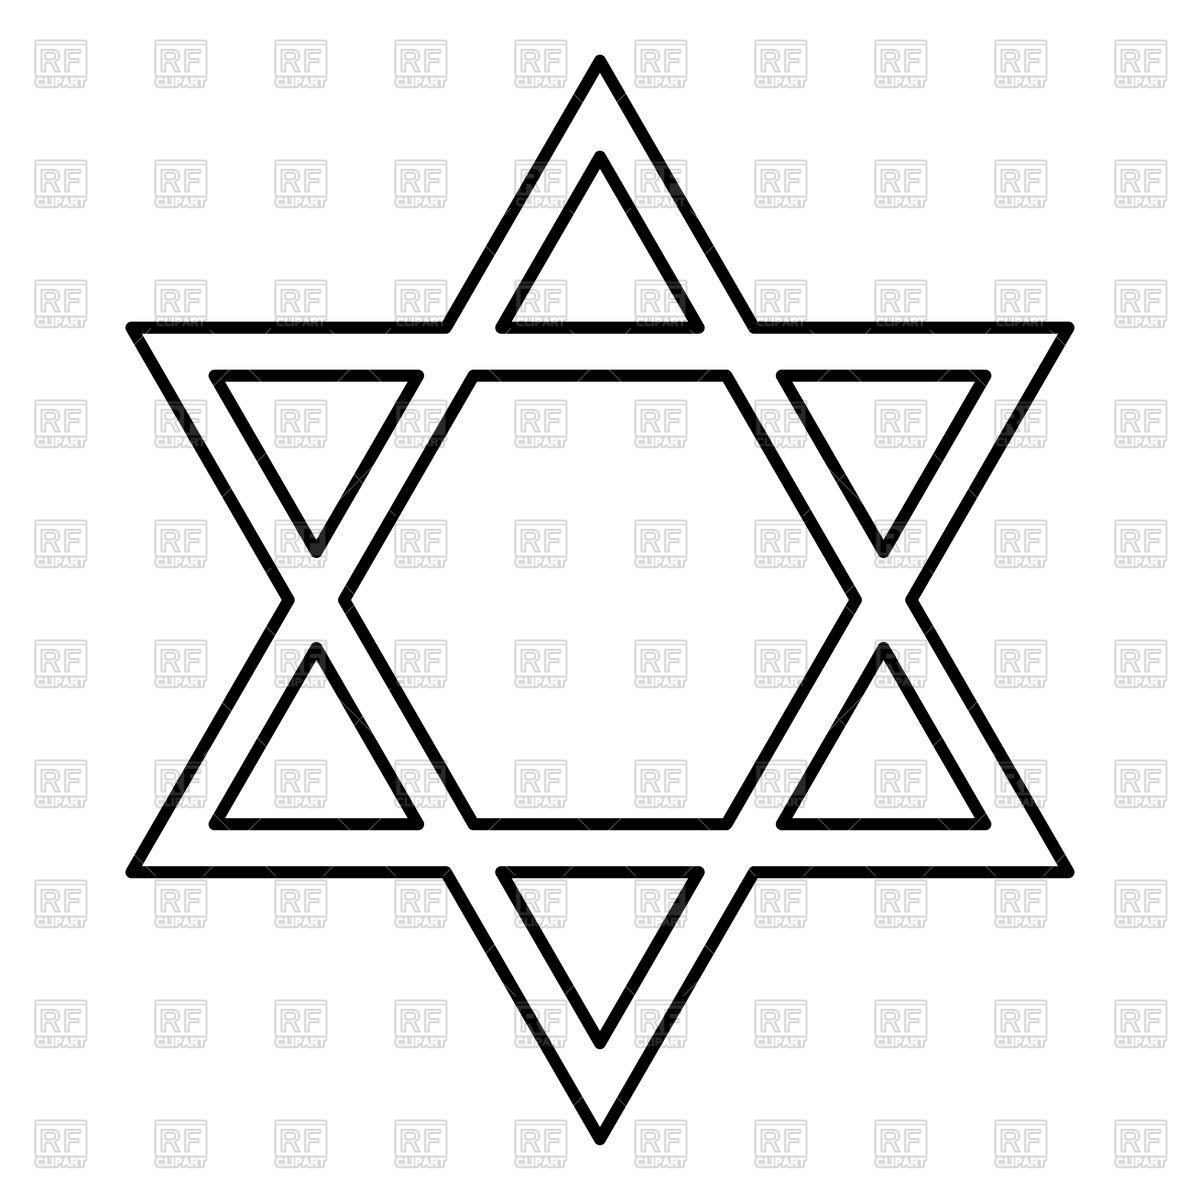 1200x1200 Jewish Star Of David Outline Vector Image Vector Artwork Of